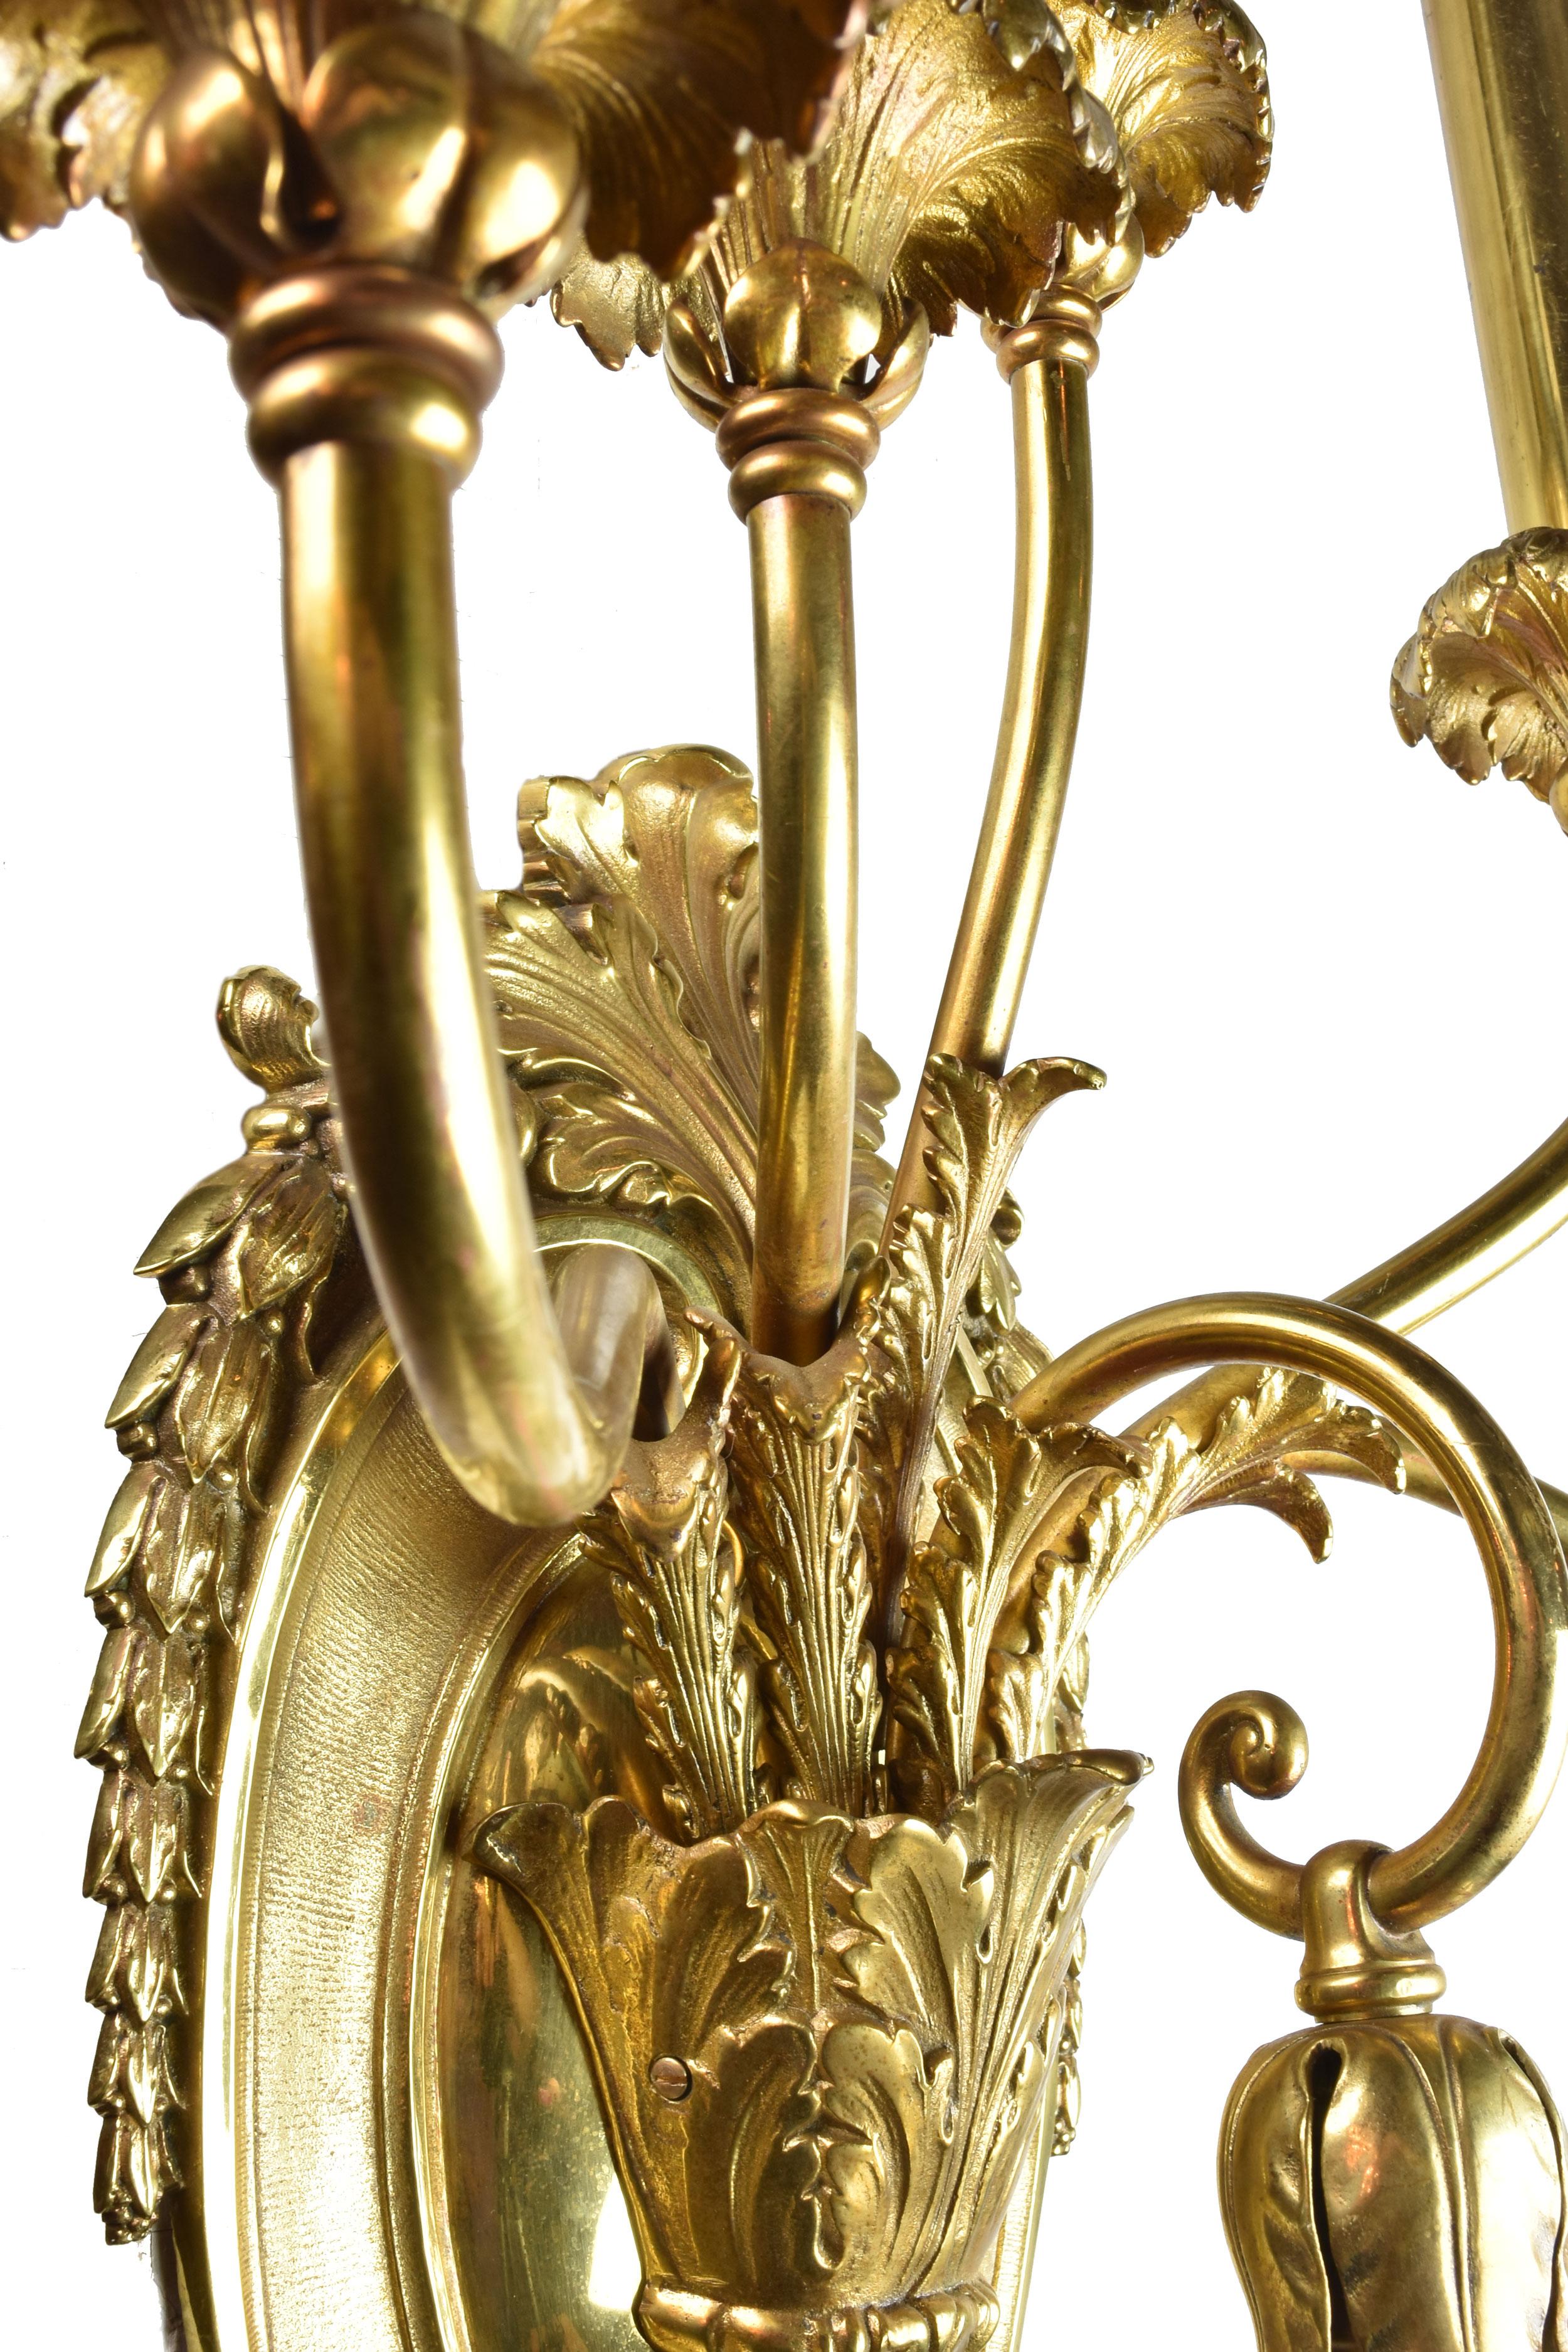 48438-oversized-cast-brass-sconce-pair-close.jpg